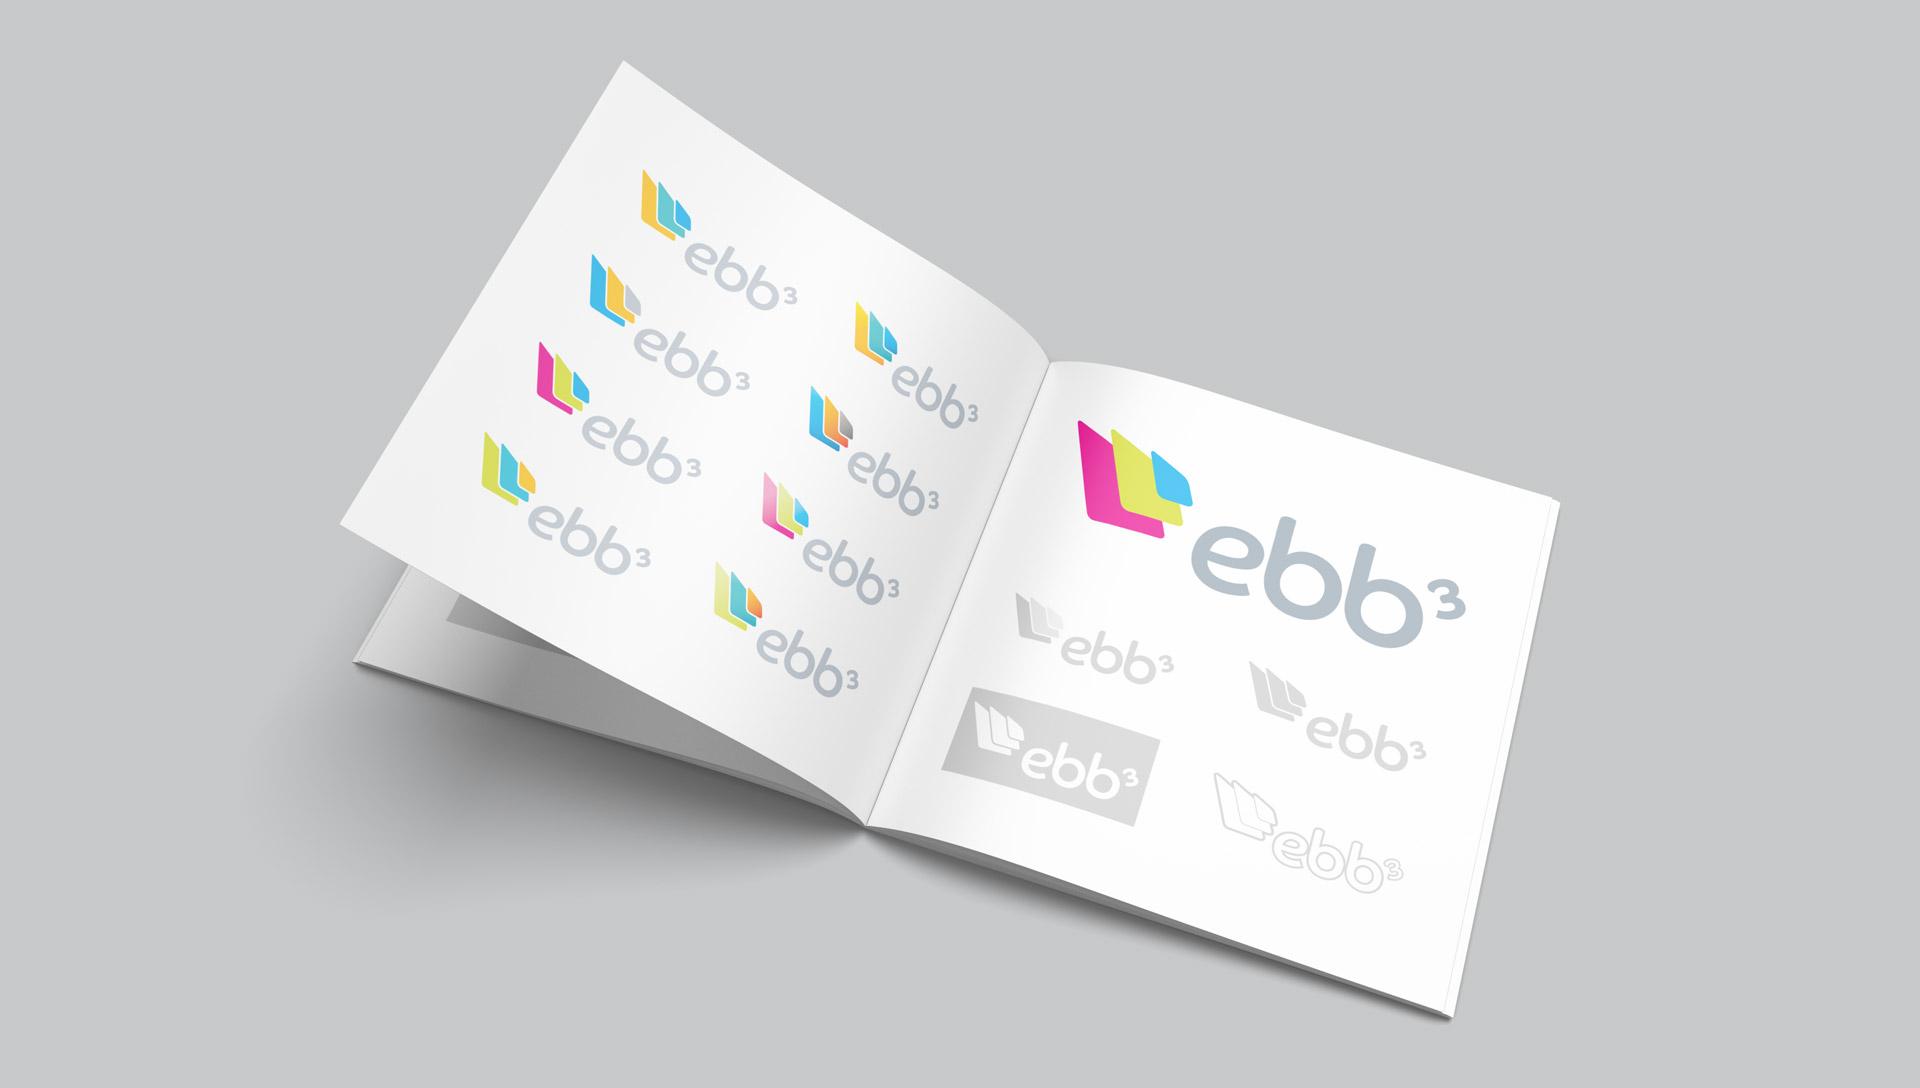 ebb3 logo design branding system